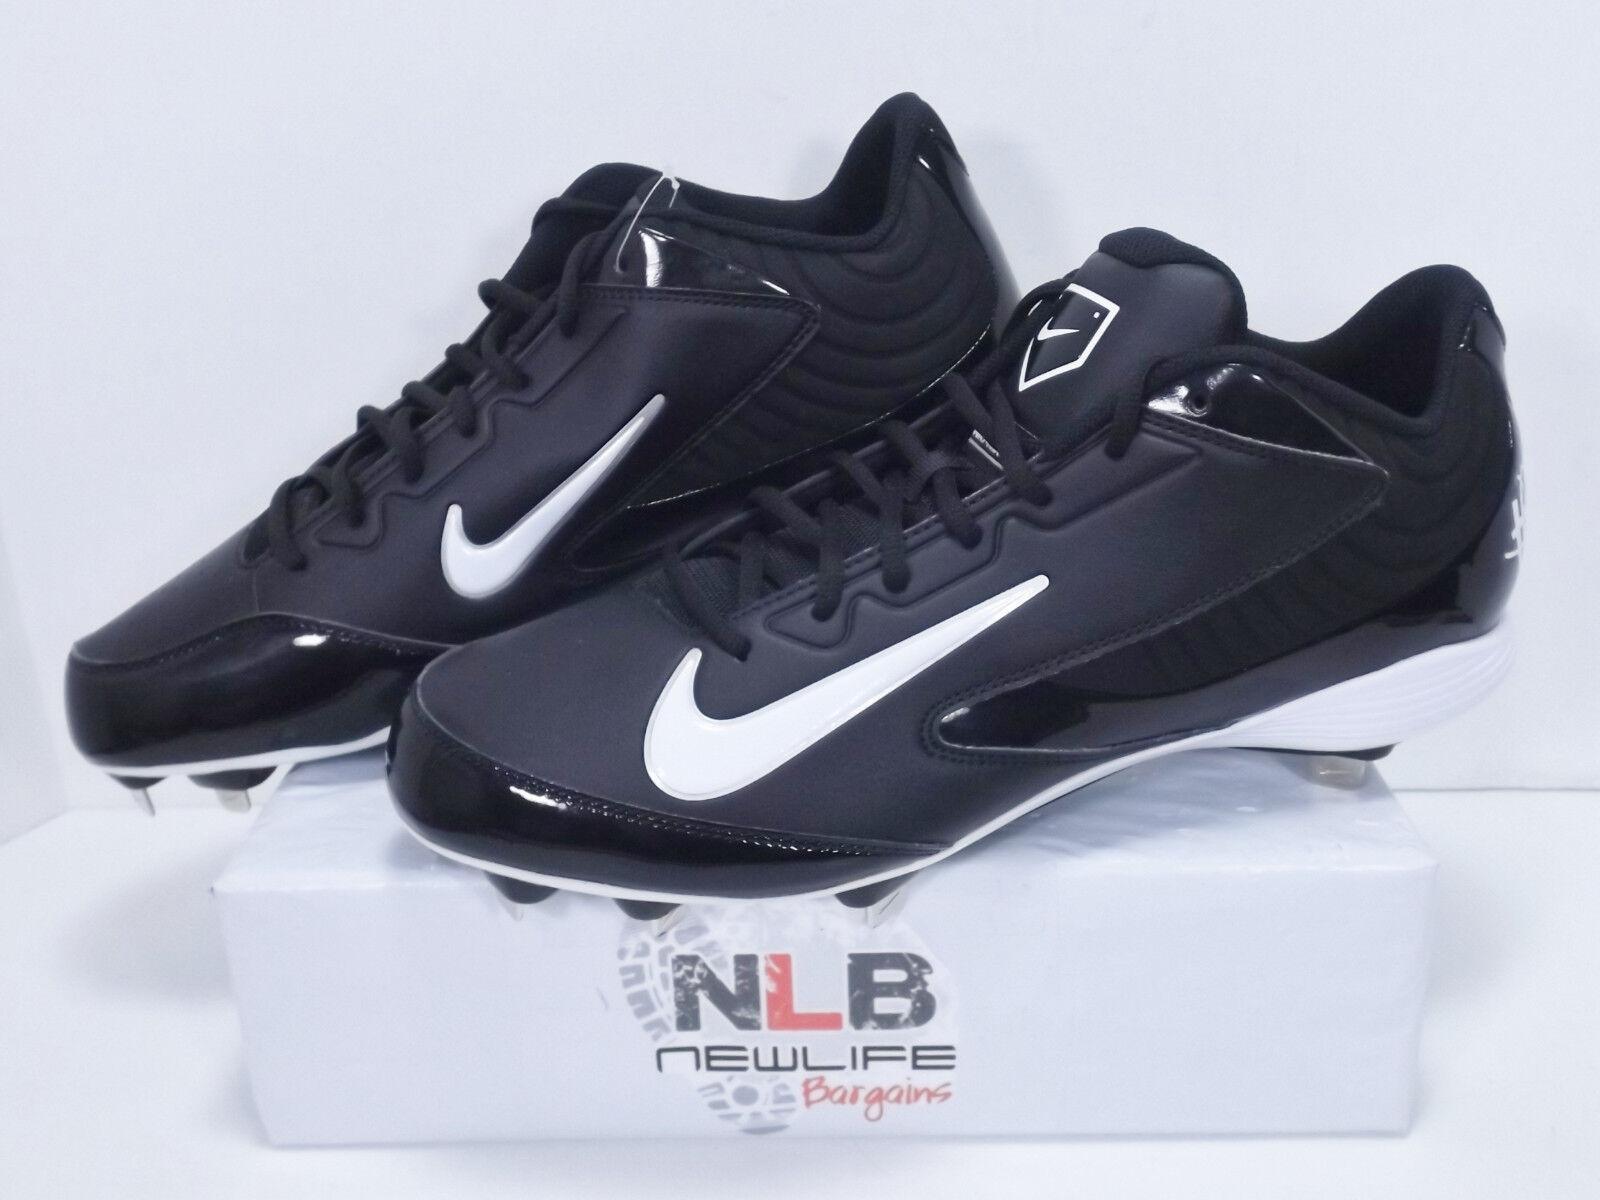 Nike Huarache Strike Low Metal 615963-010 Black/White Men's Comfortable Special limited time